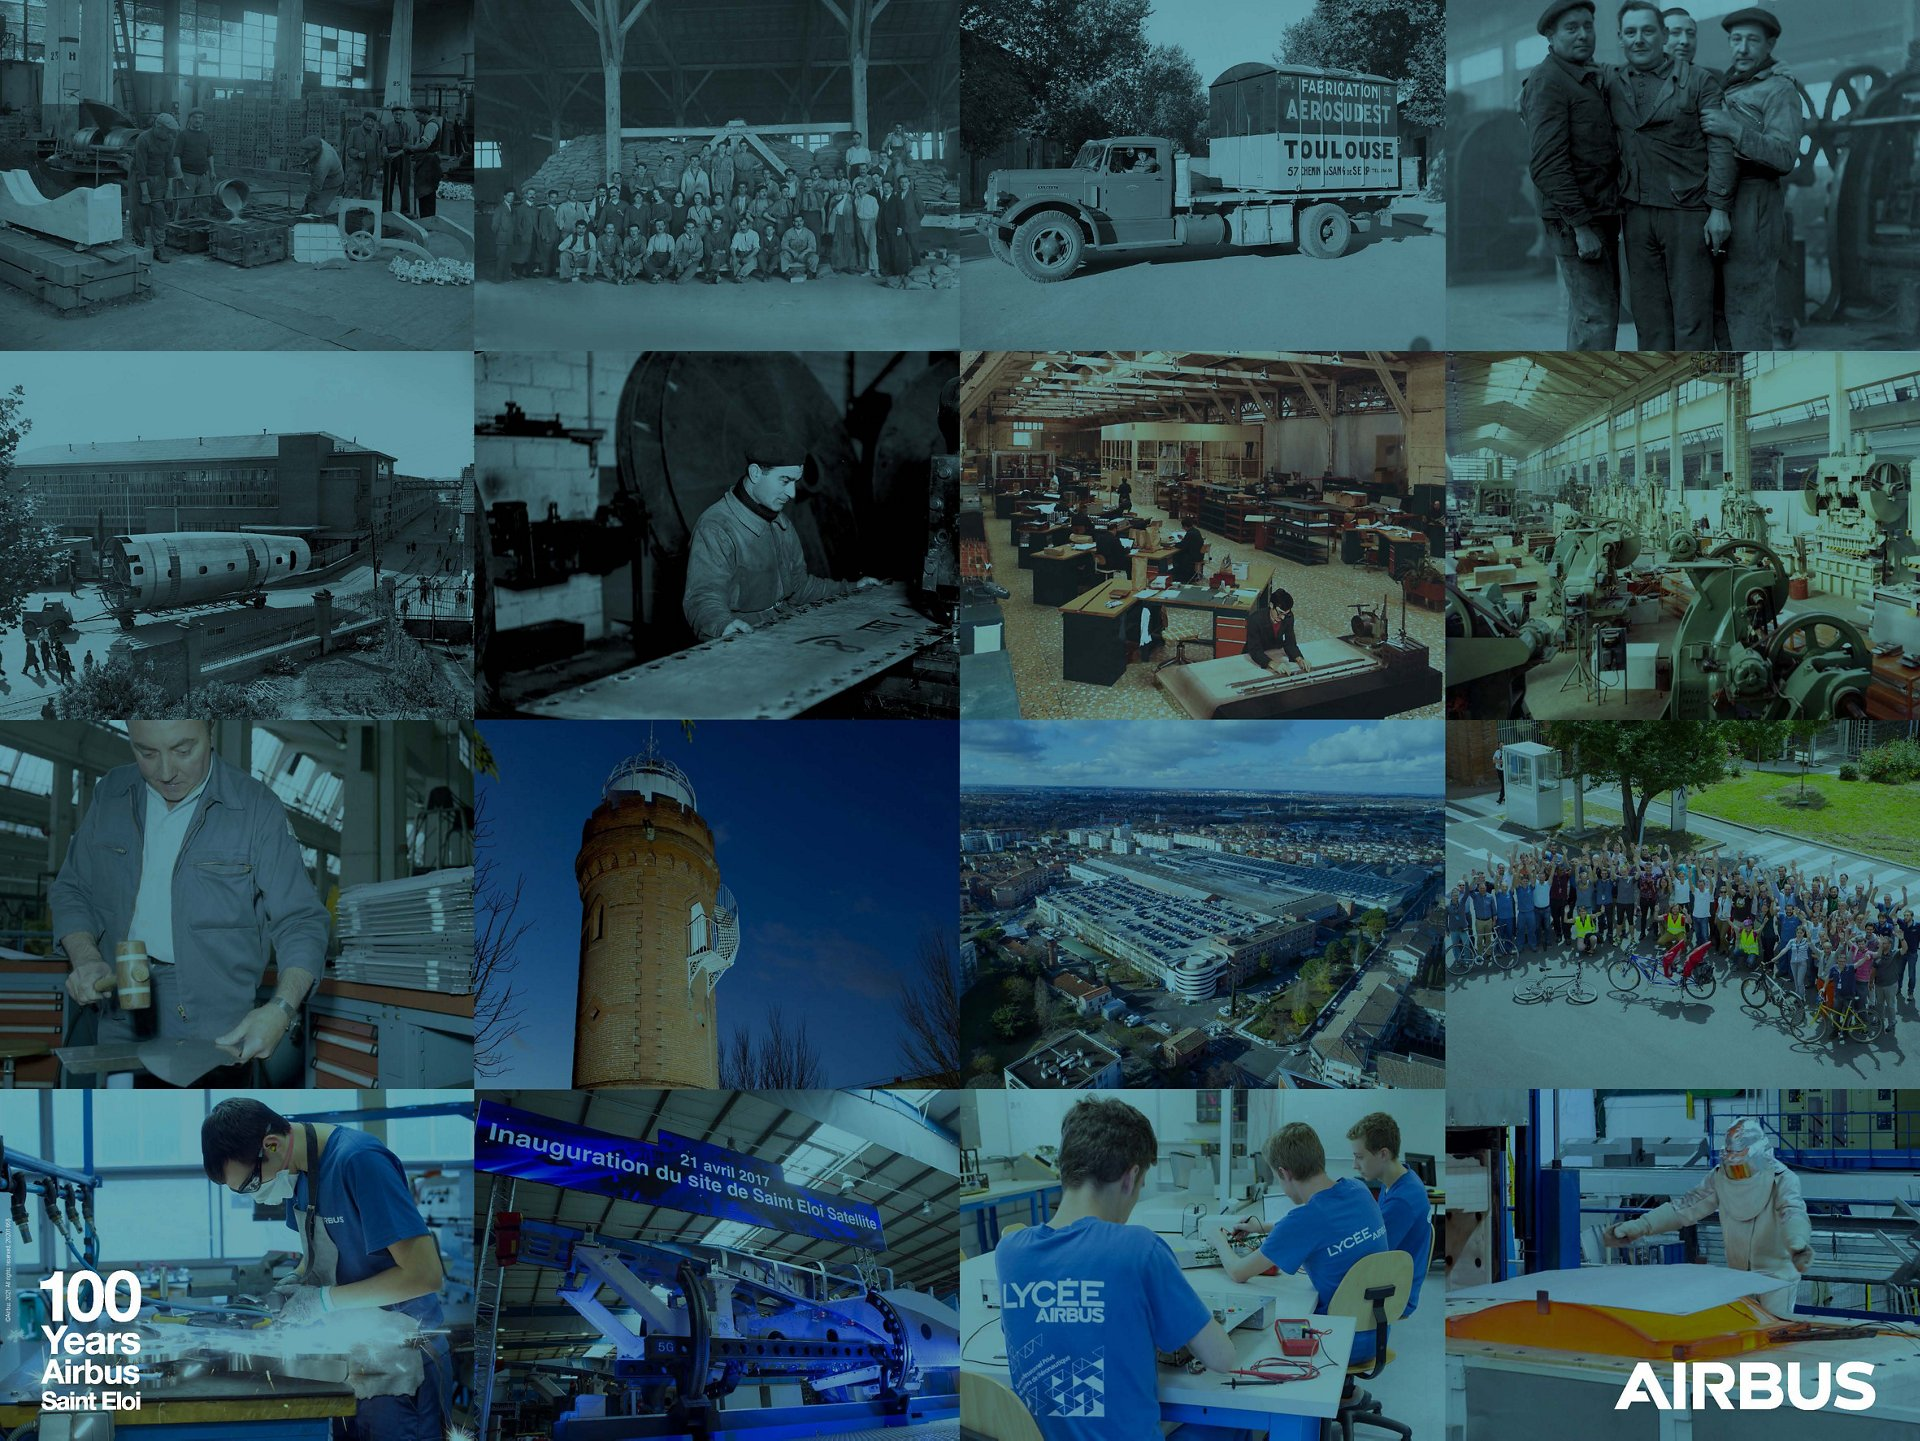 Airbus Saint Eloi celebrates ... 100 years of Passion